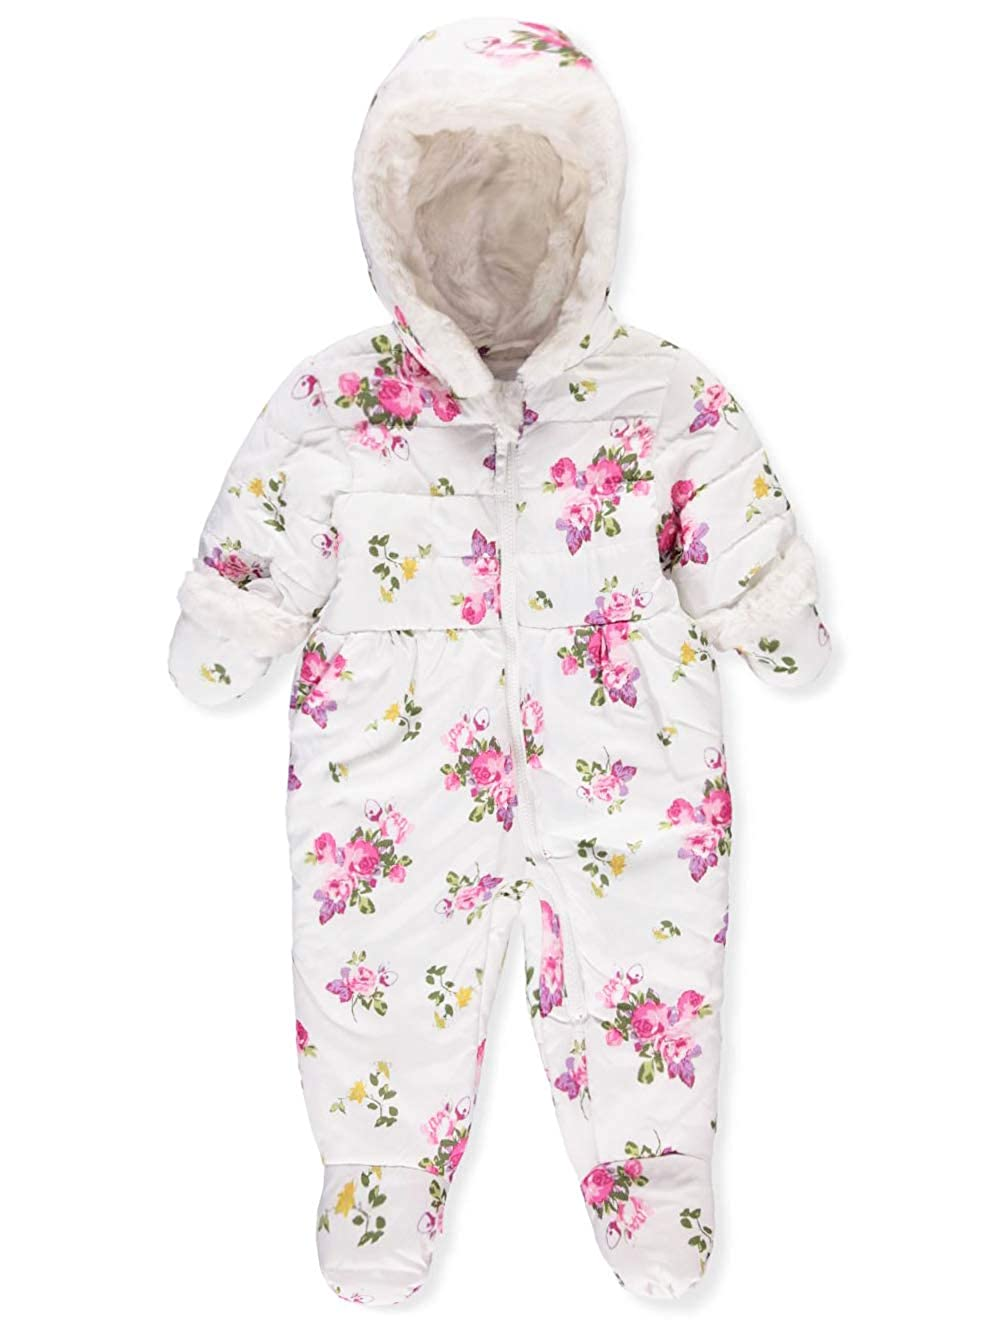 Rothschild Baby Girls' Insulated Pram Suit